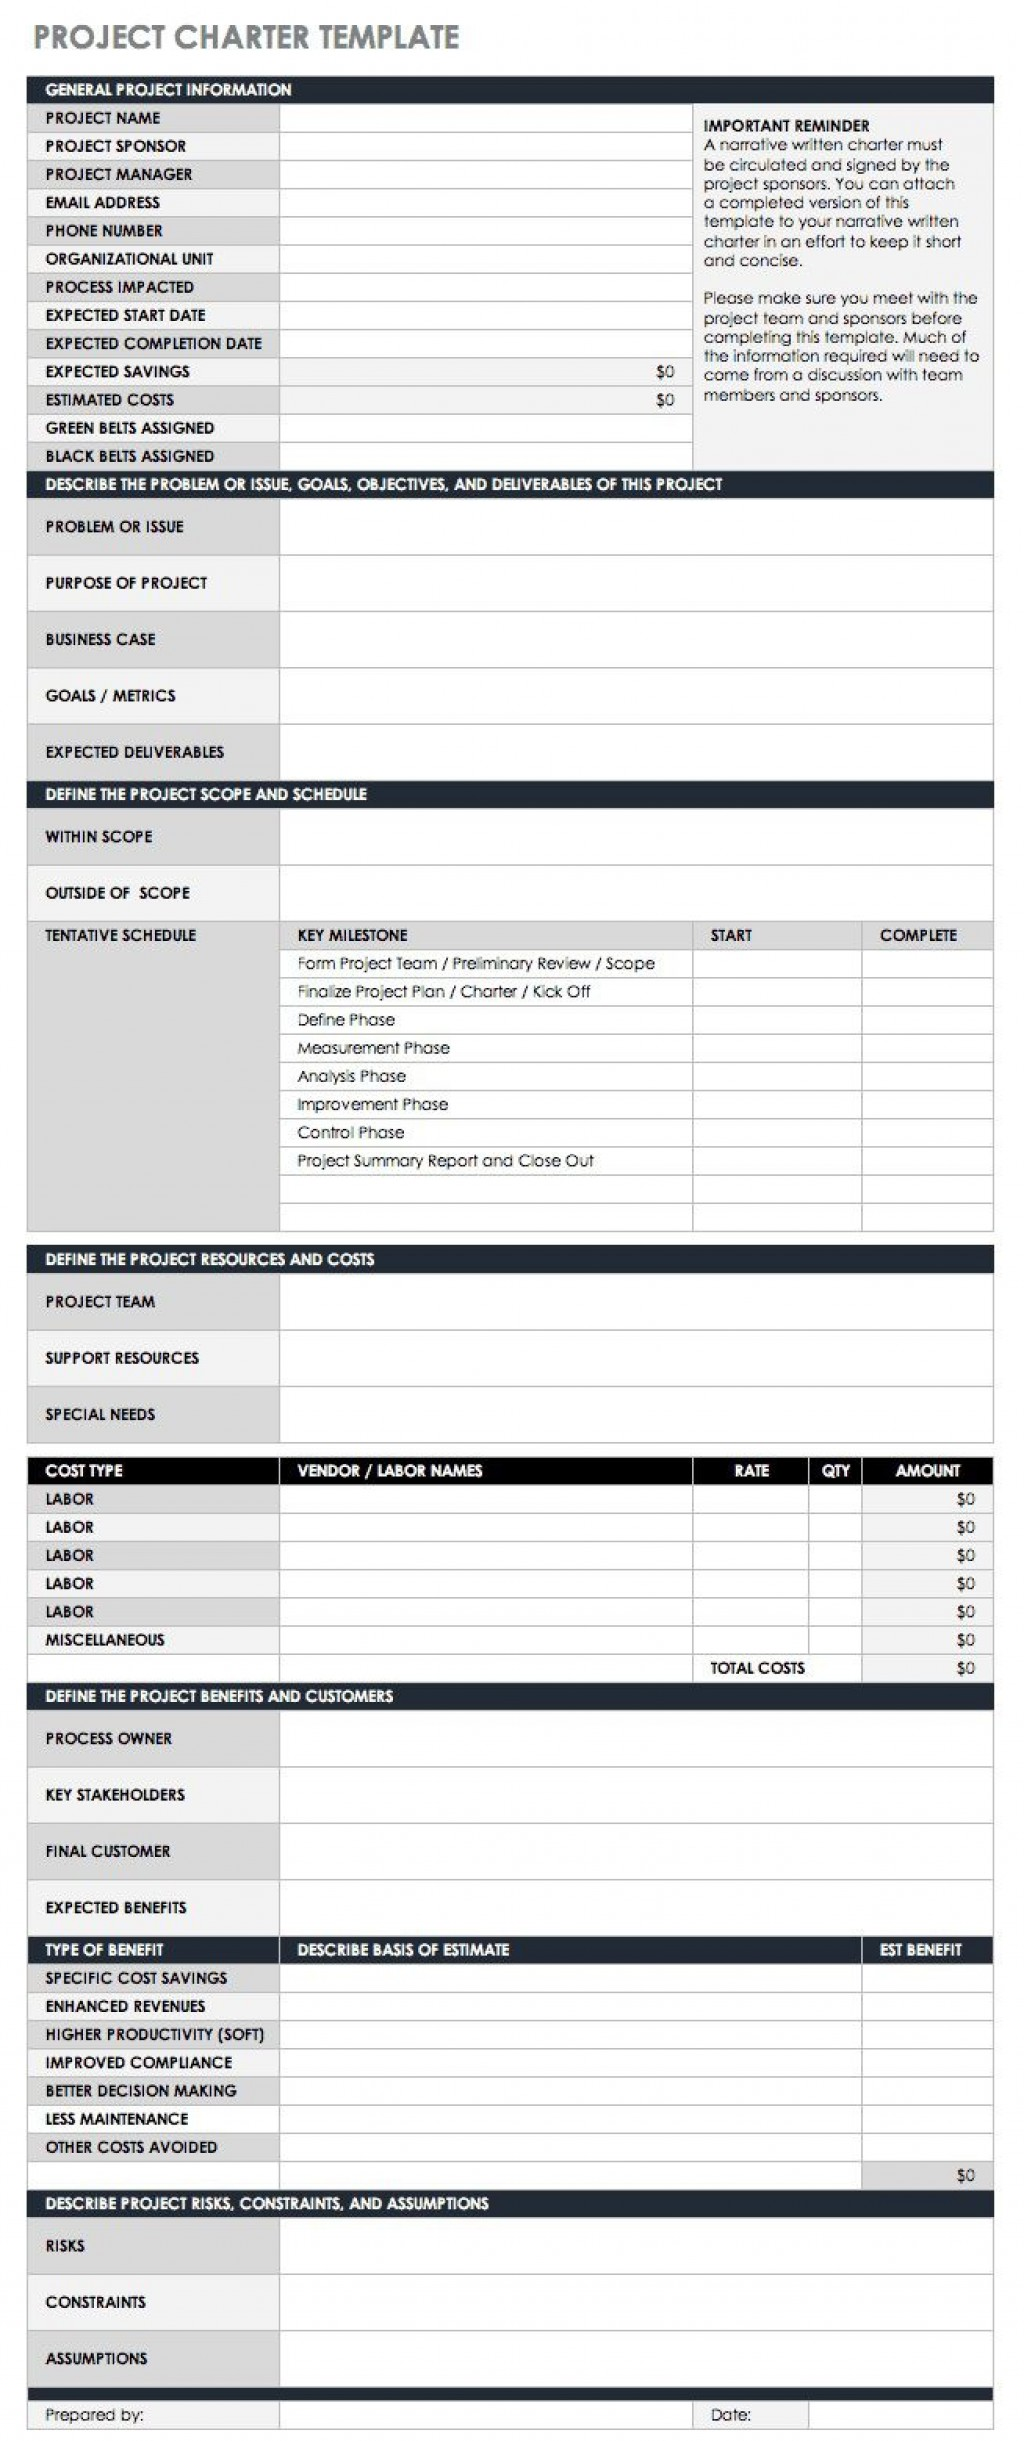 004 Surprising Project Charter Template Excel Photo  Lean Pmbok NederlandLarge